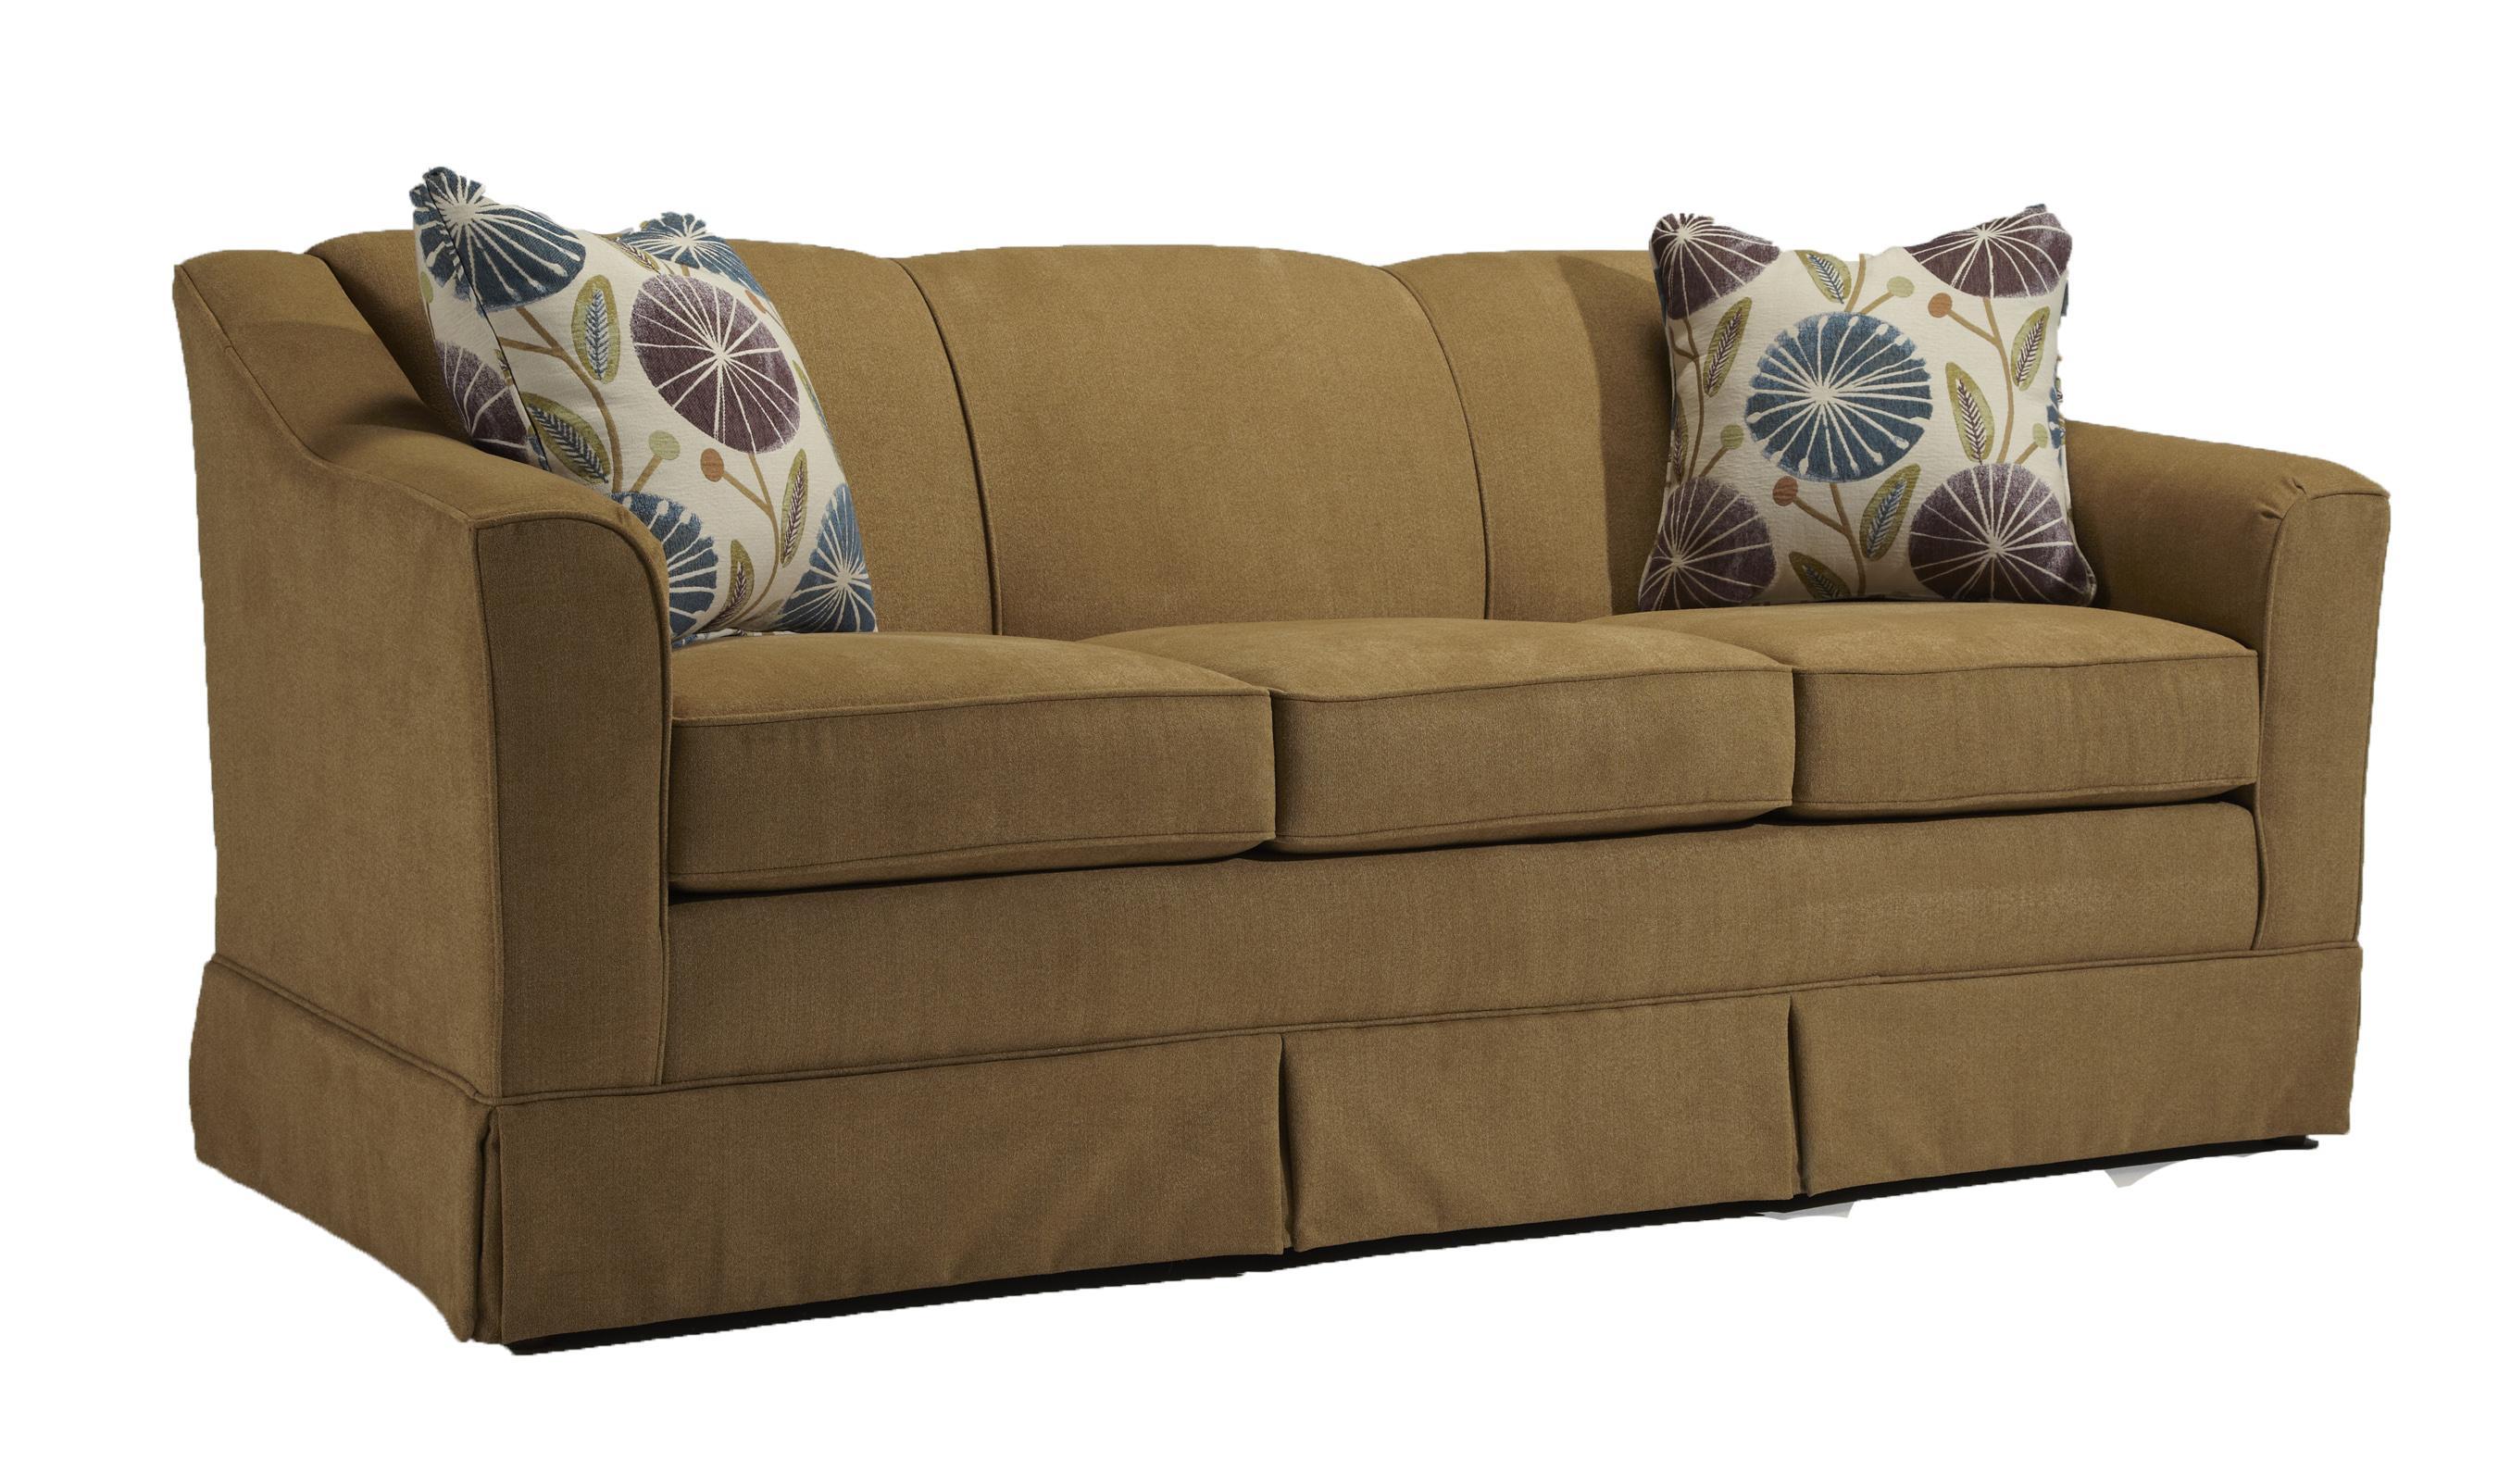 Best Home Furnishings Emeline Customizable Sofa - Item Number: S9XX